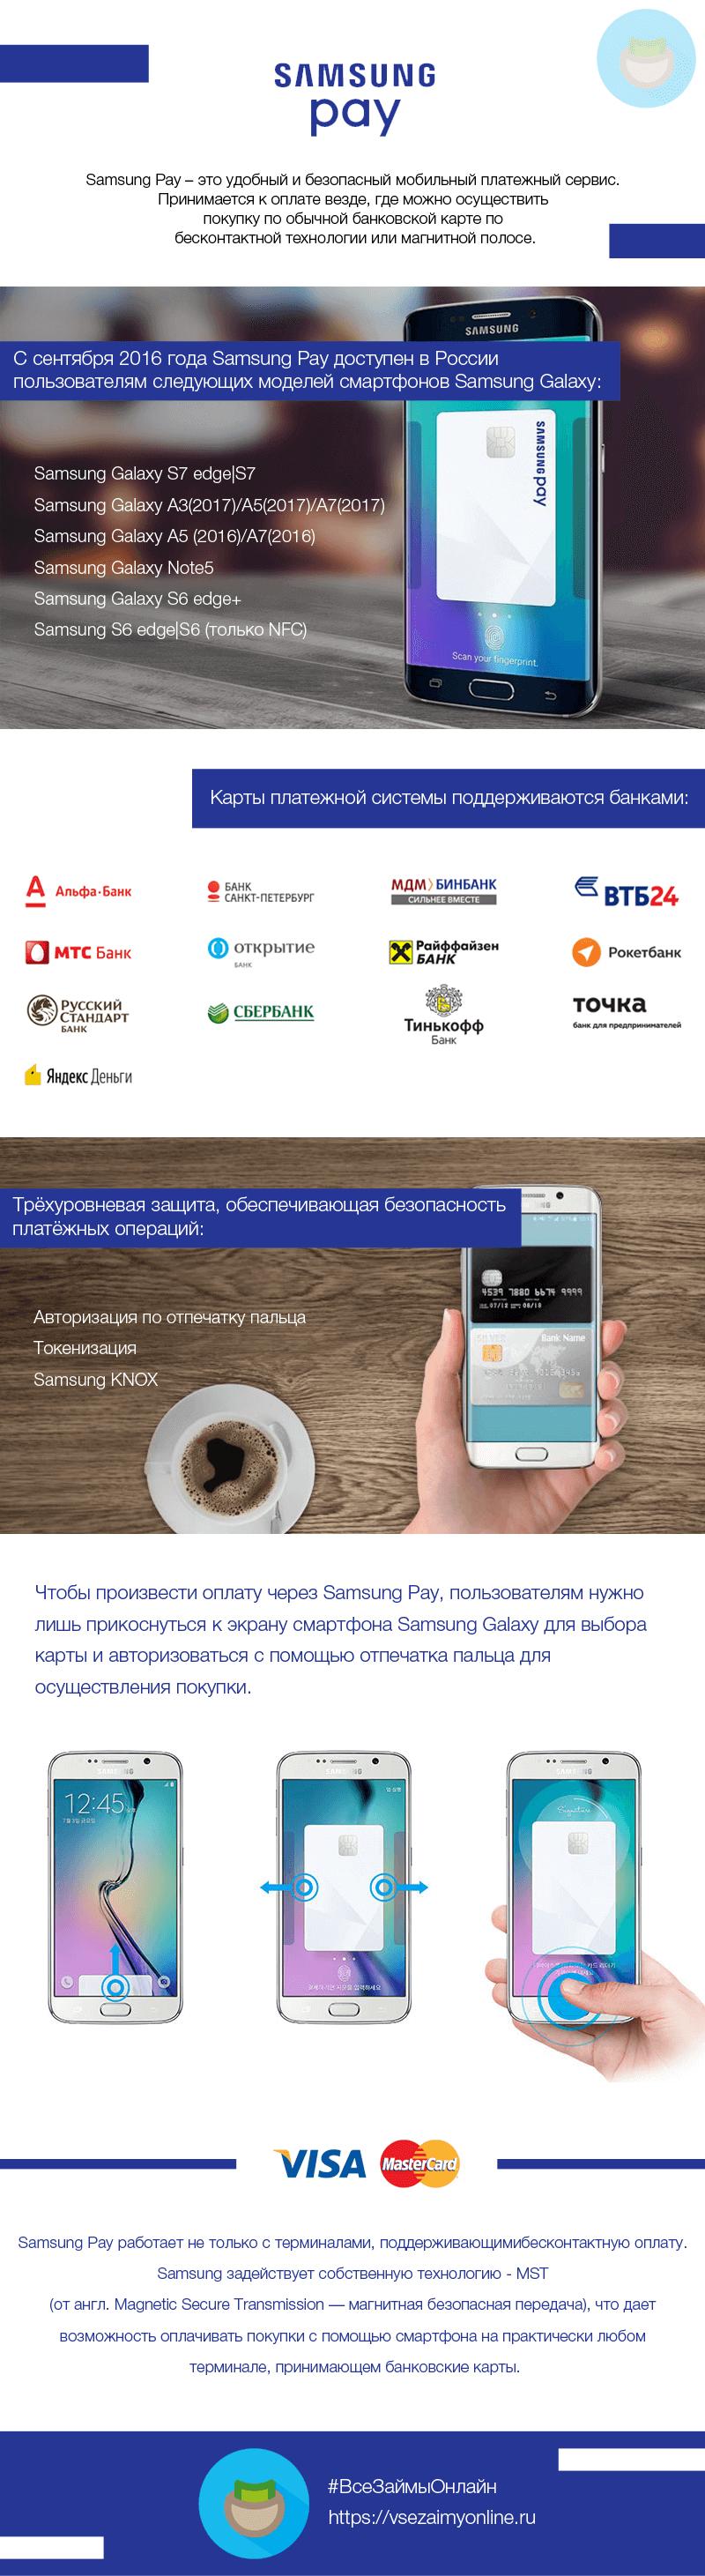 Samsung Pay инфографика